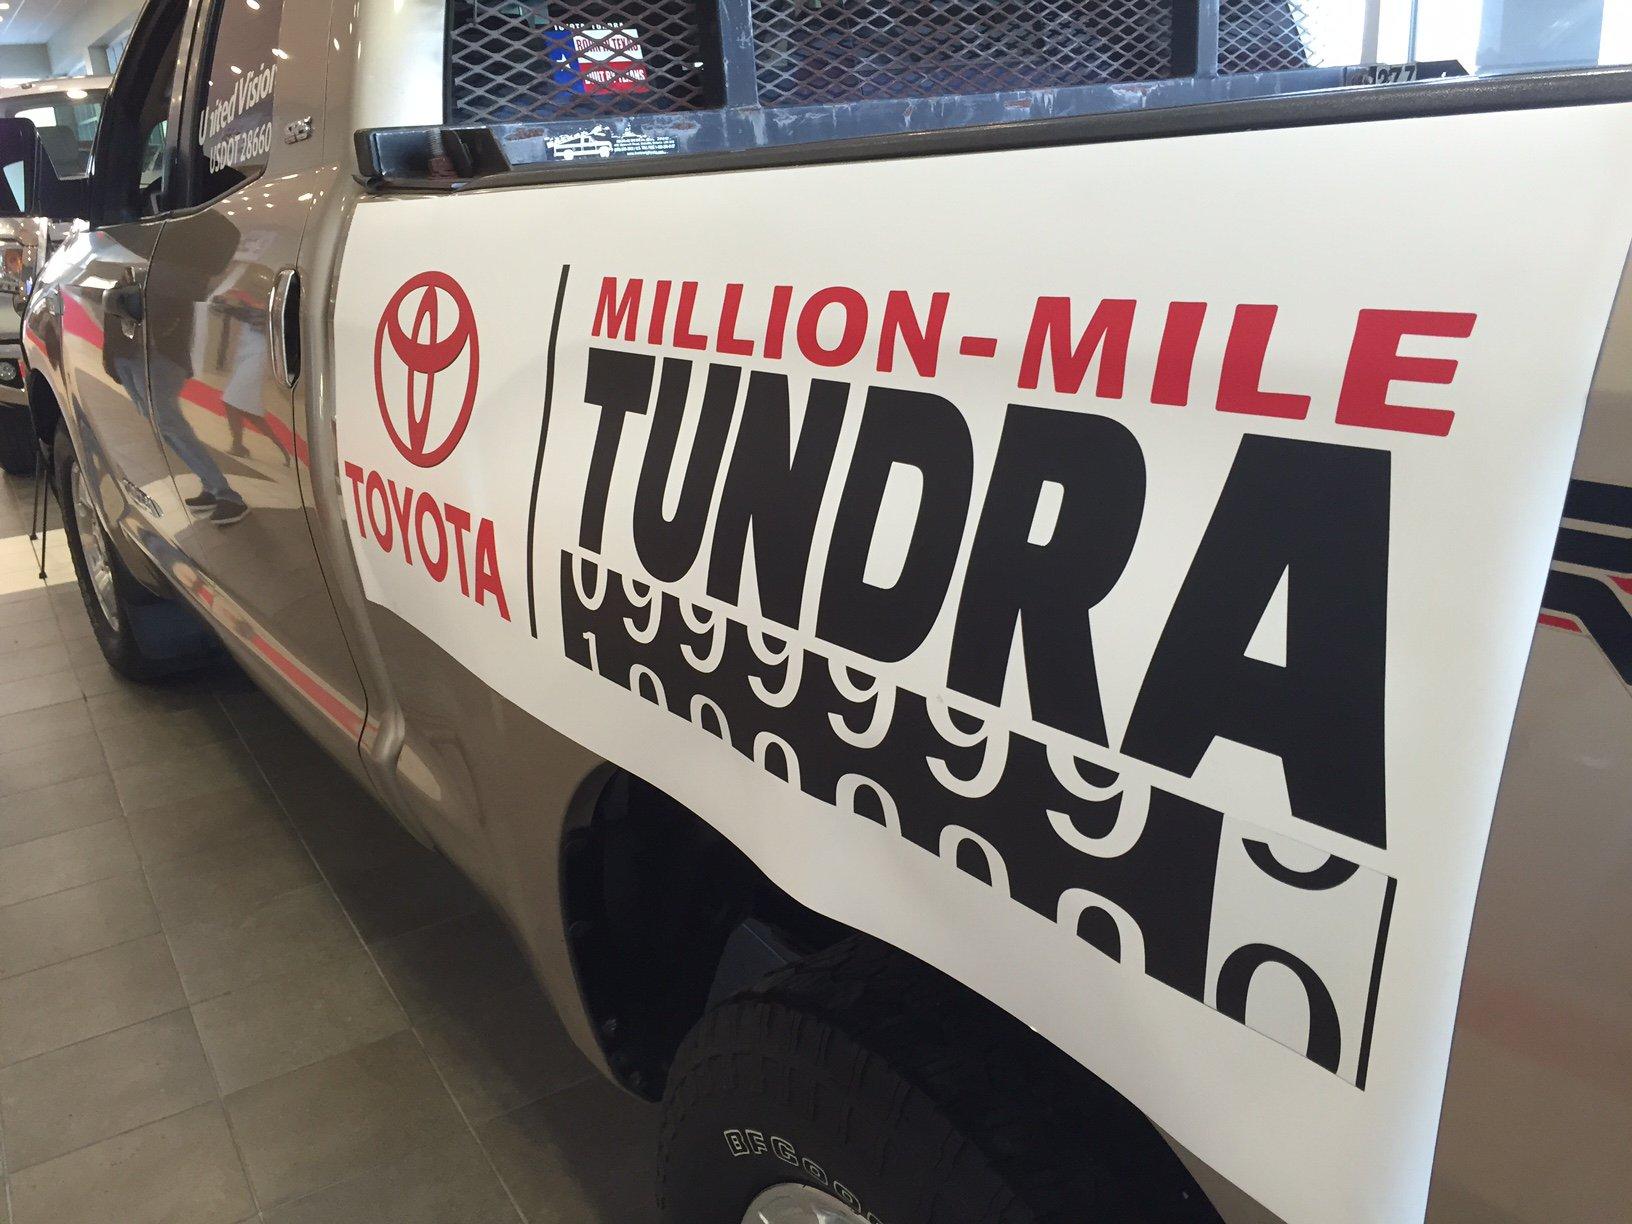 Million-mile-tundra-13